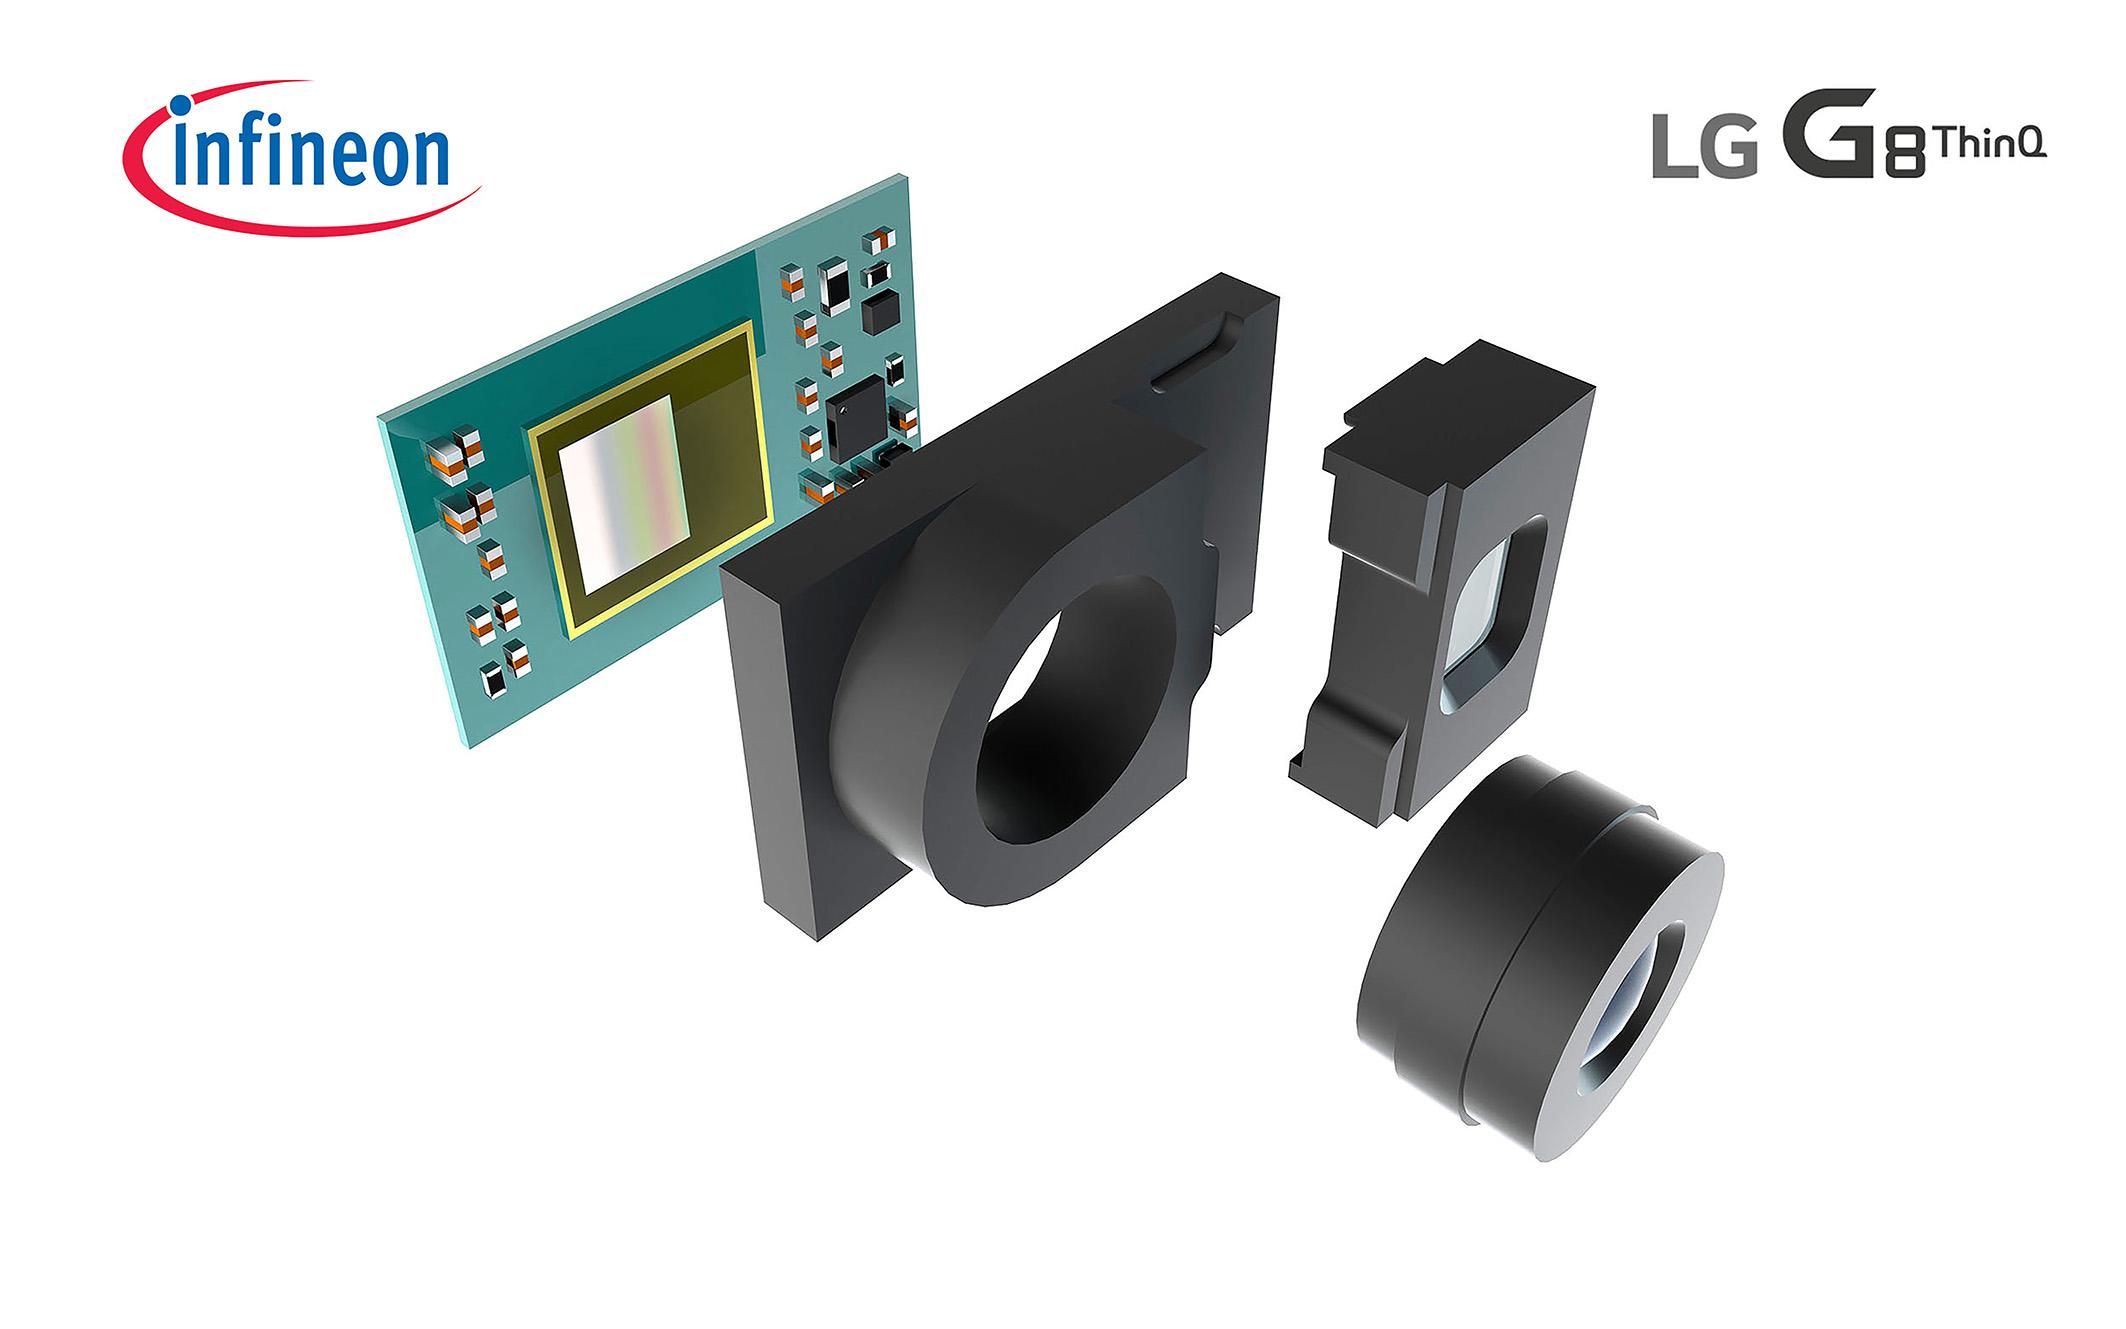 LG与英飞凌推出采用前置飞行时间摄像头的LG G8ThinQ手机